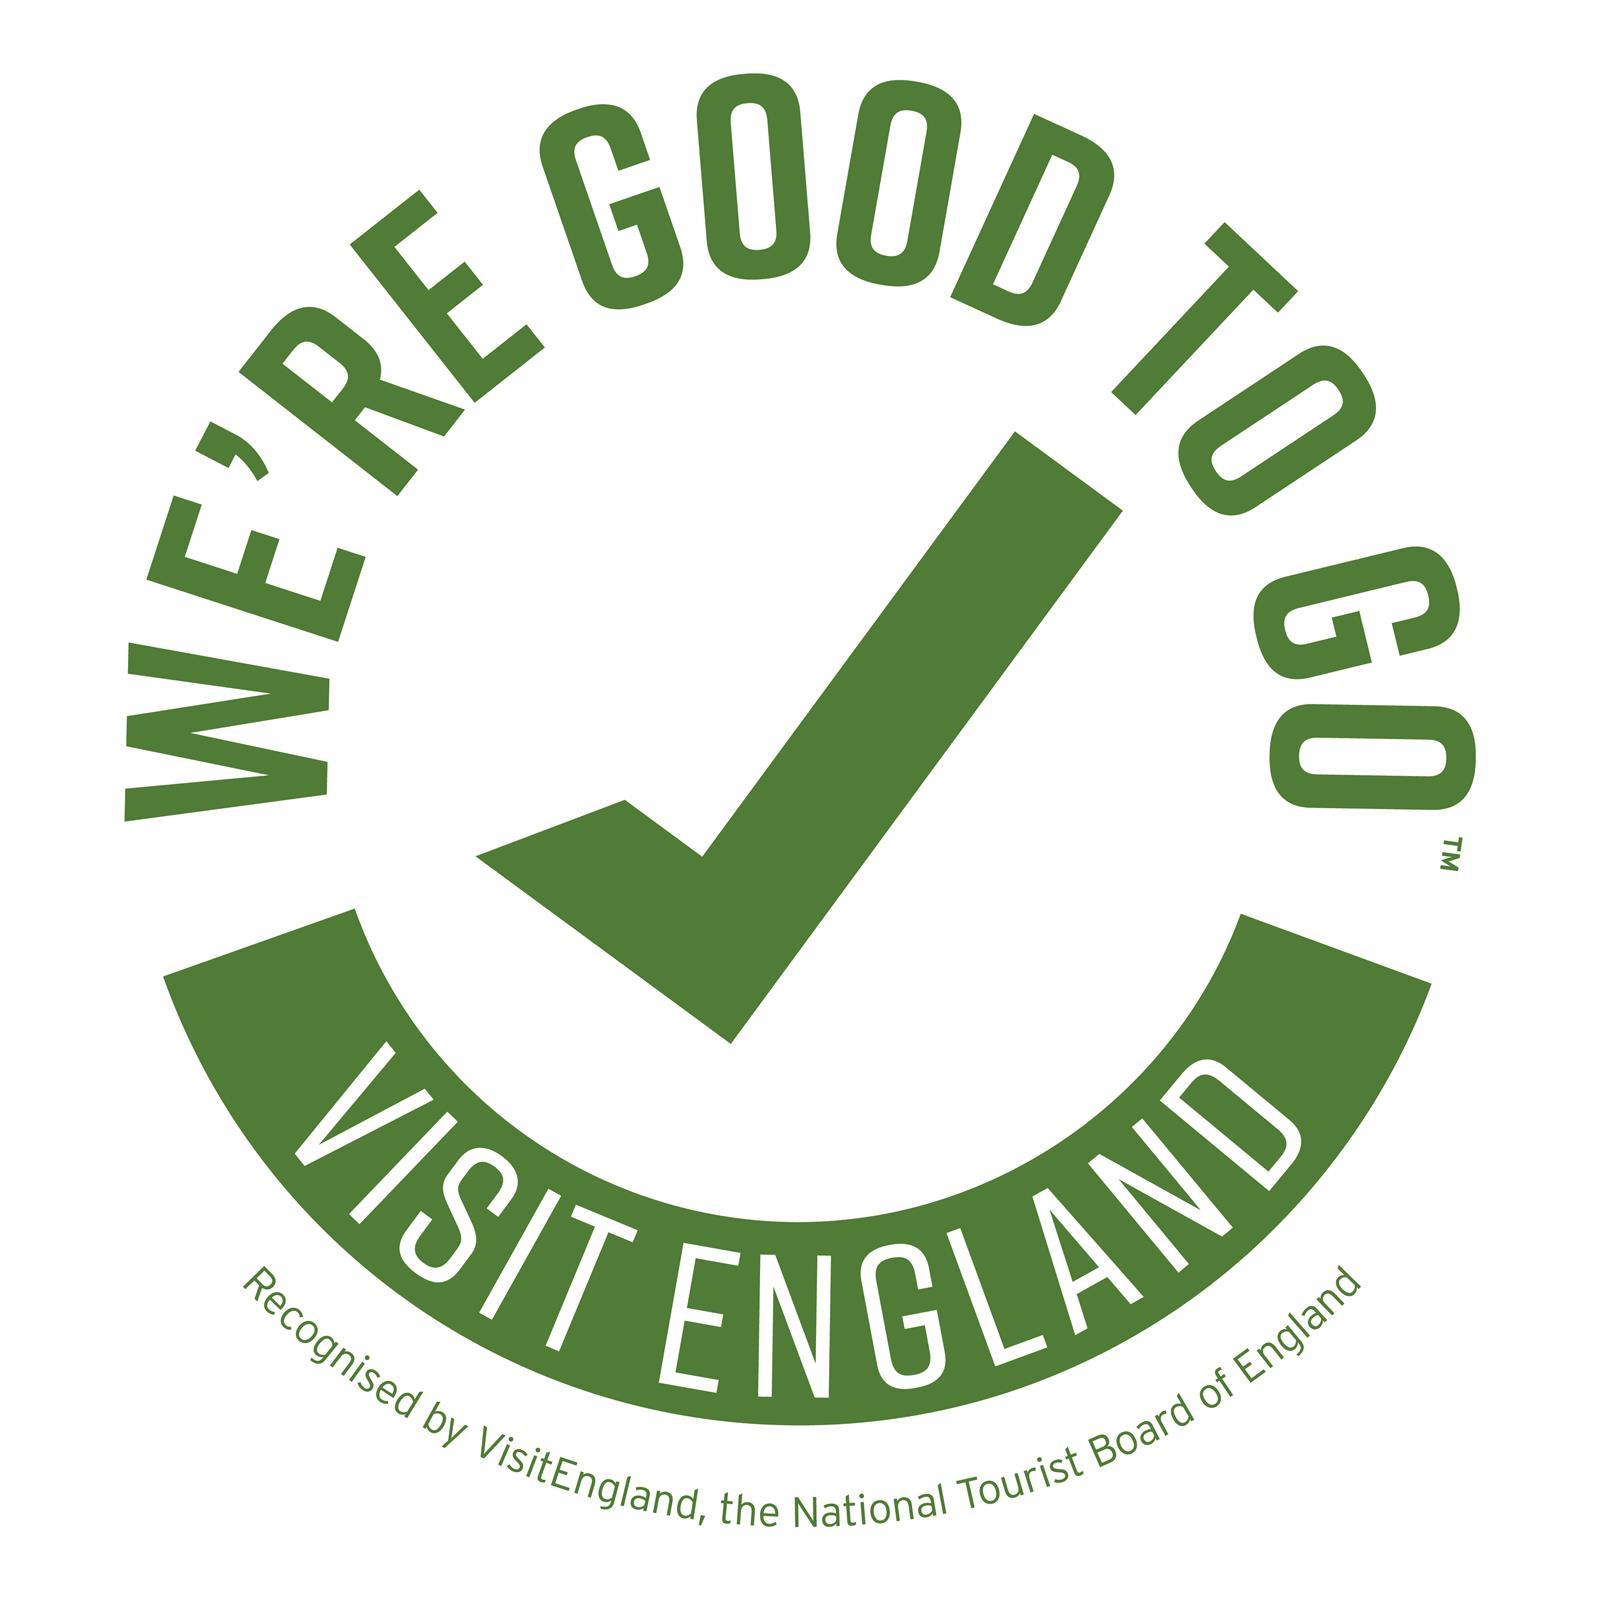 VisitEngland 'We're Good to Go' accreditation Scheme